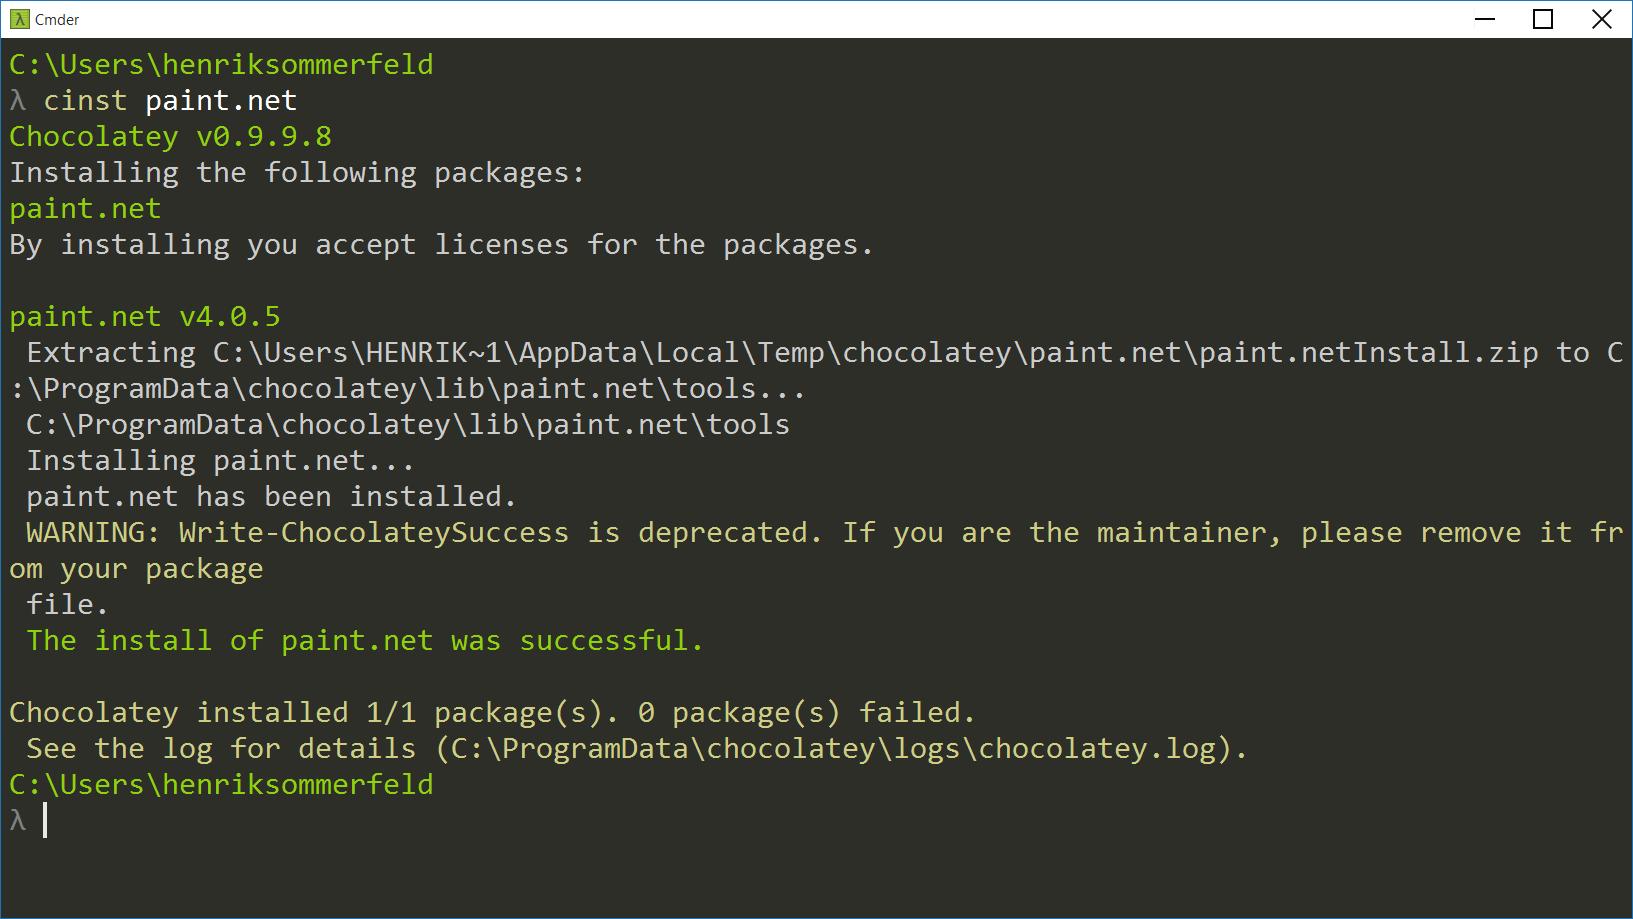 Installing Paint.NET through command line